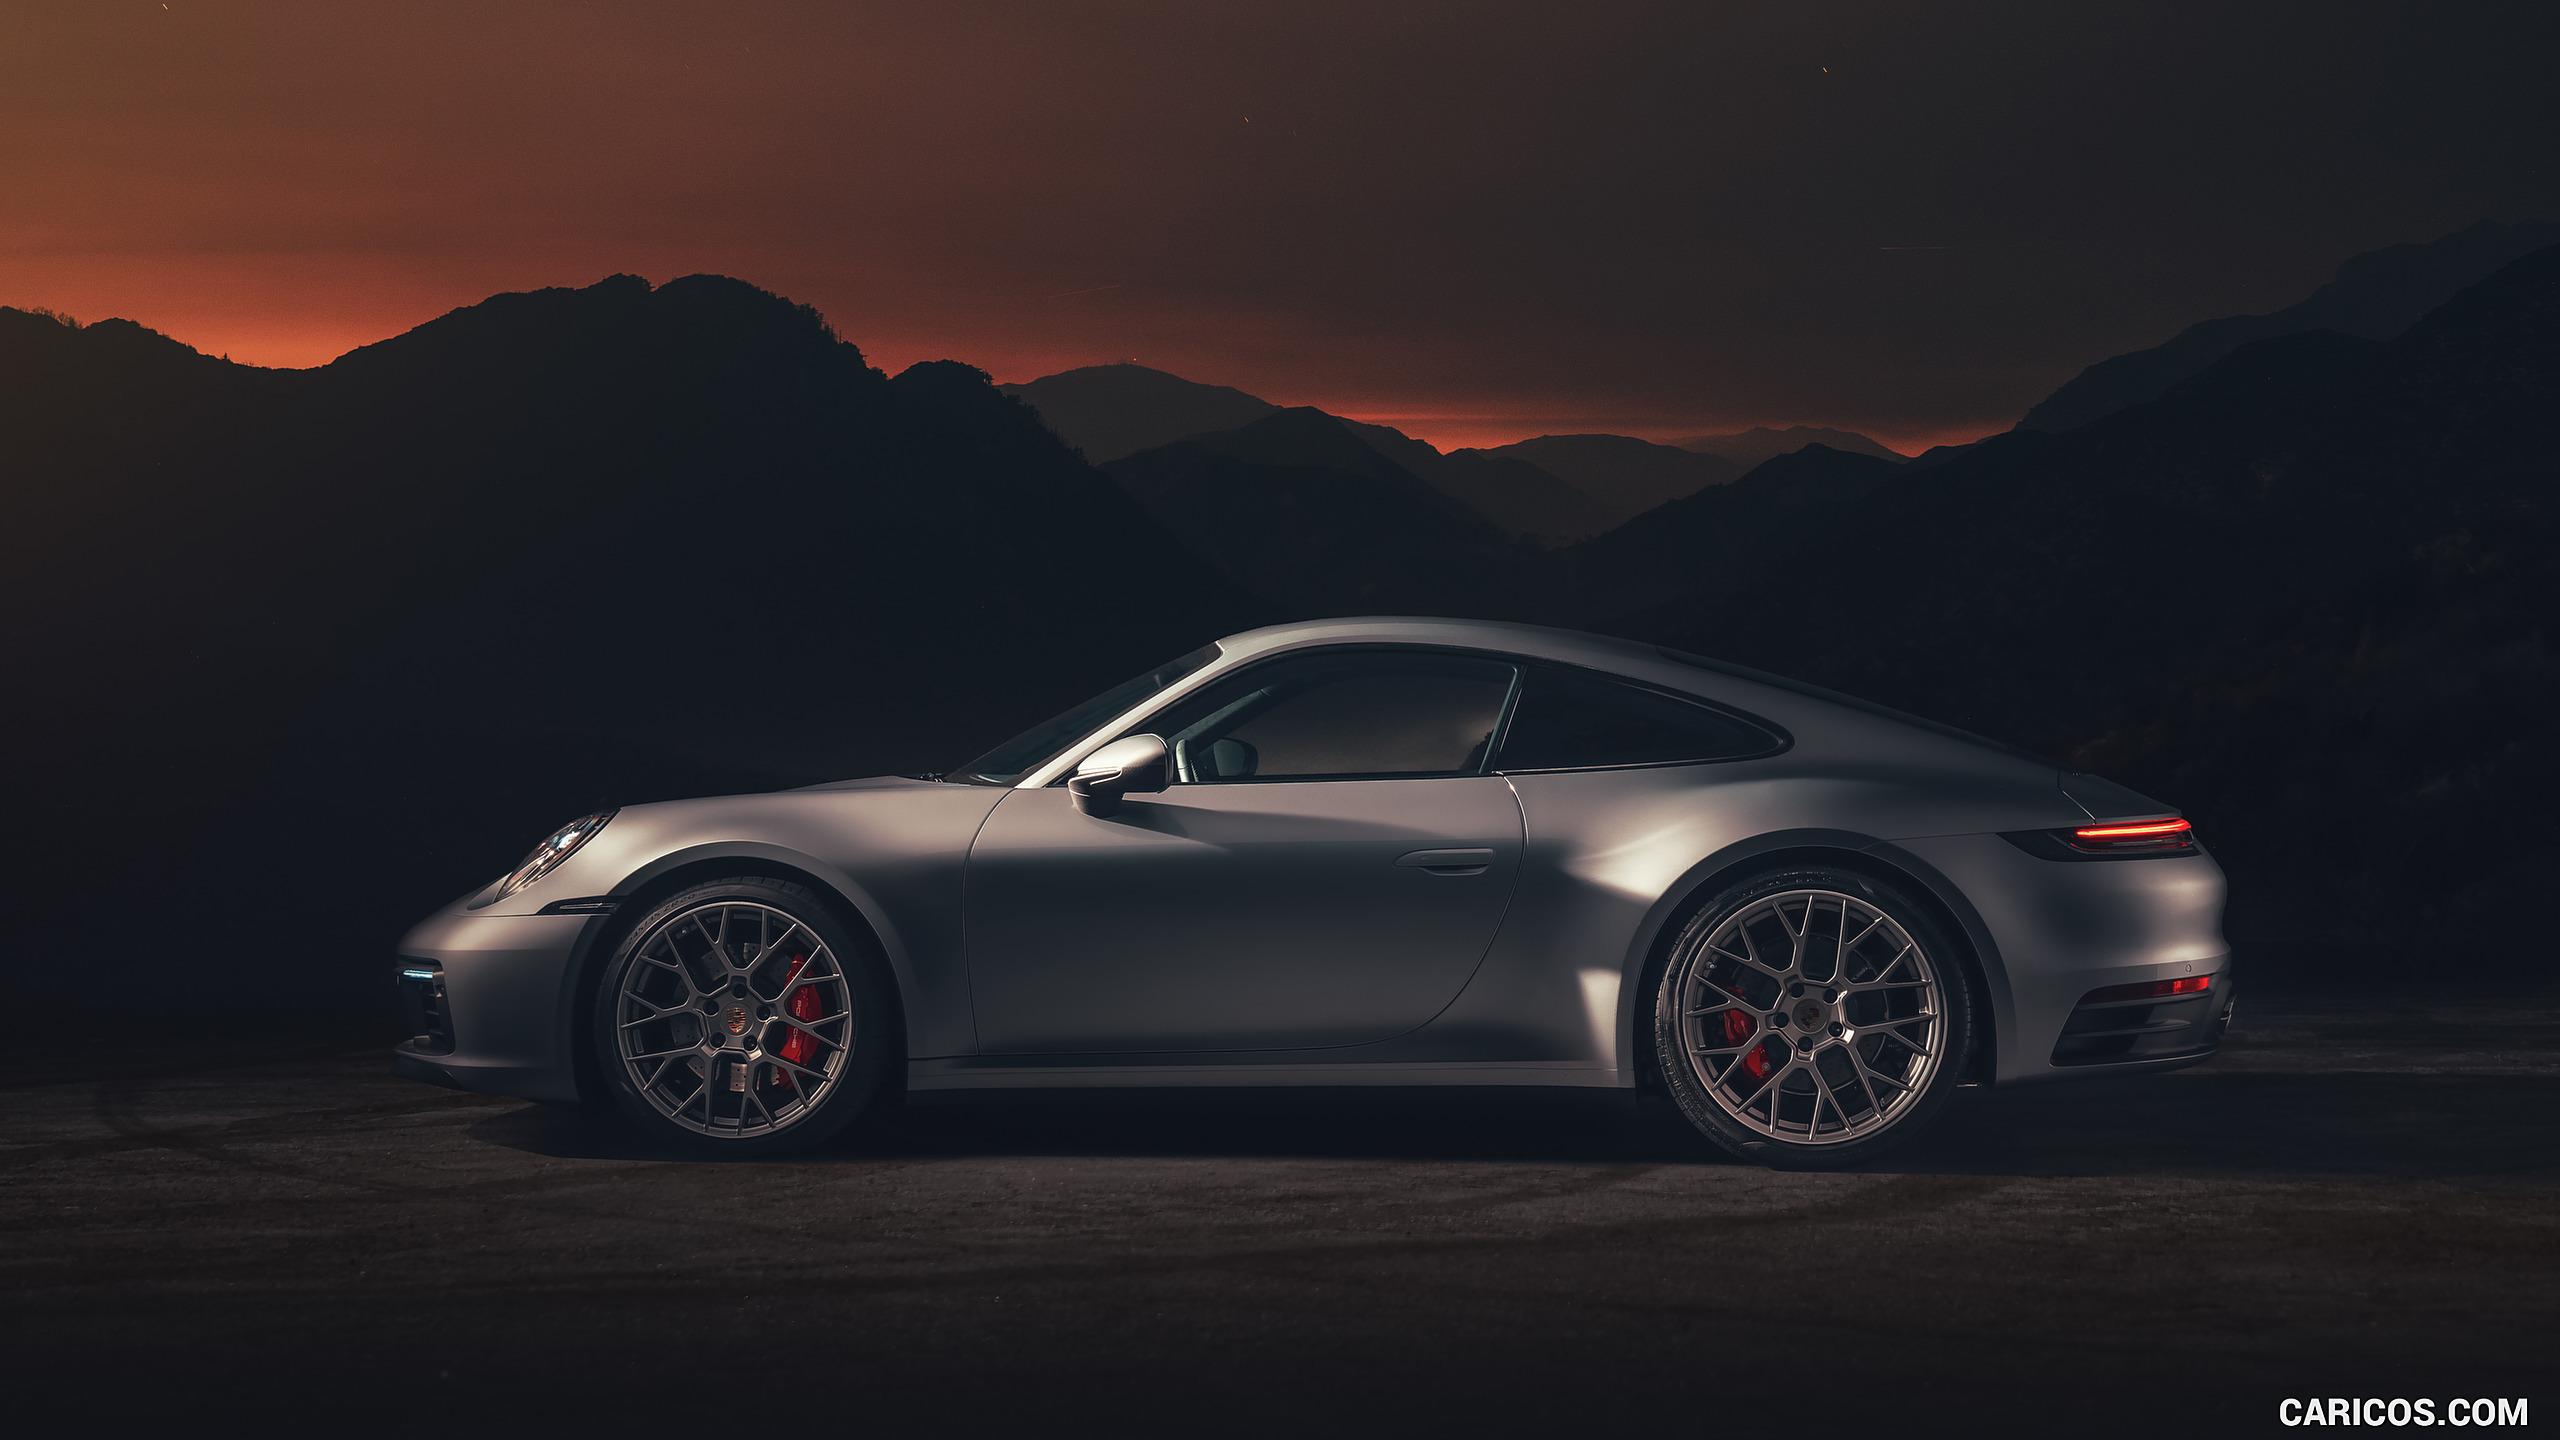 64 Porsche 911 Carrera 2020 Wallpapers On Wallpapersafari